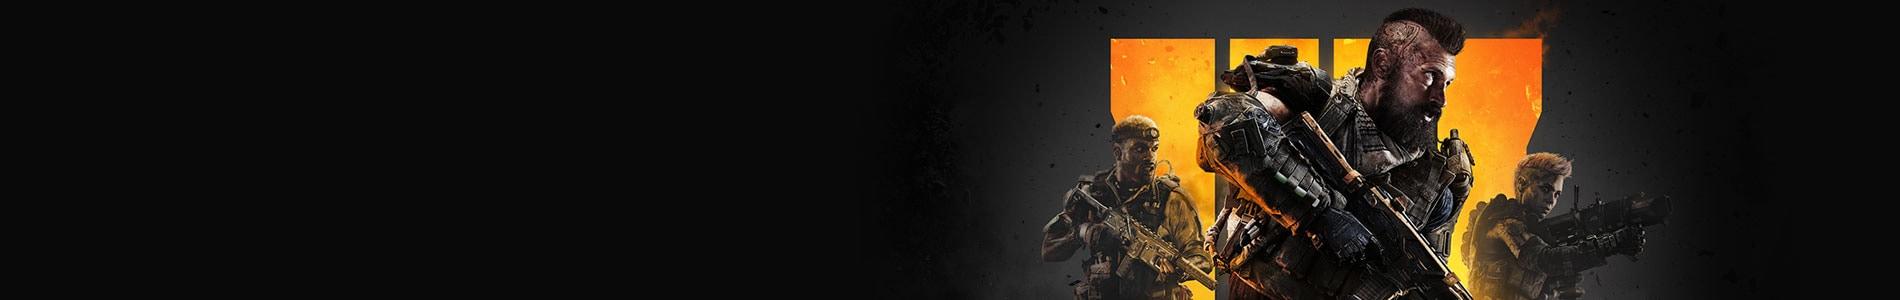 Call of Duty: BO4 | ร้านค้า Blizzard